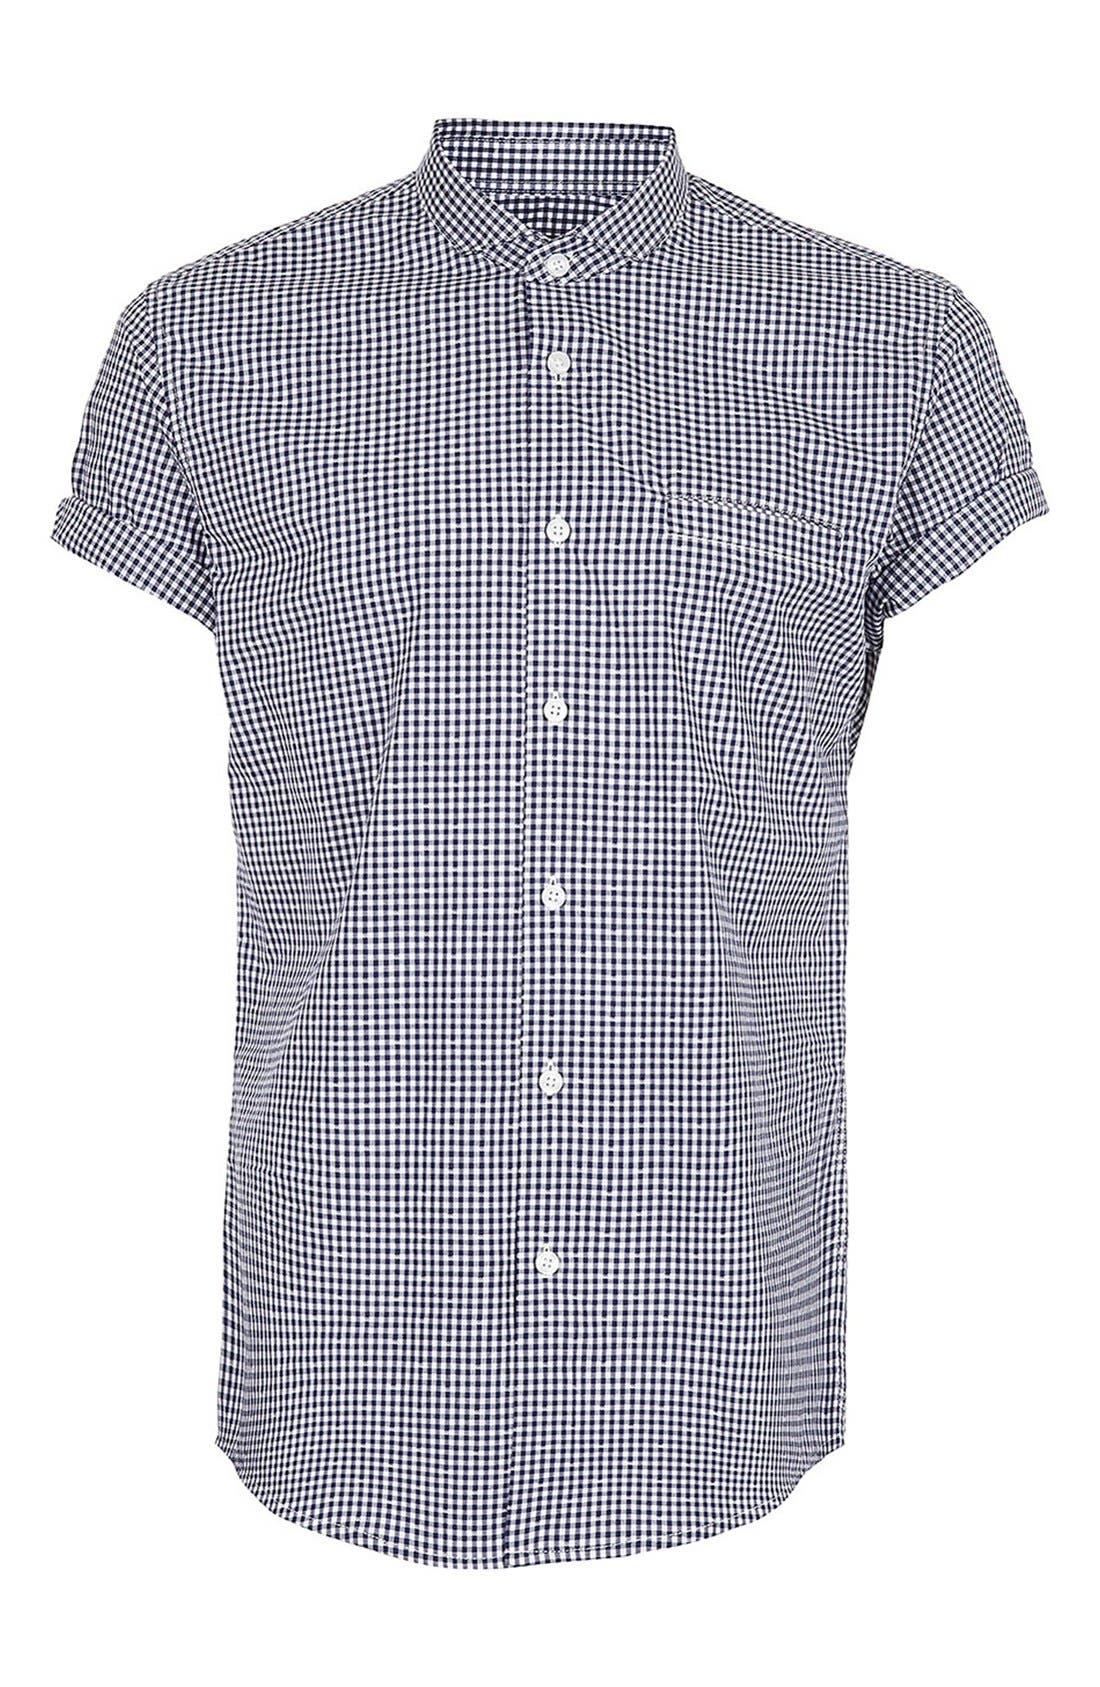 Main Image - Topman Short Sleeve Gingham Shirt